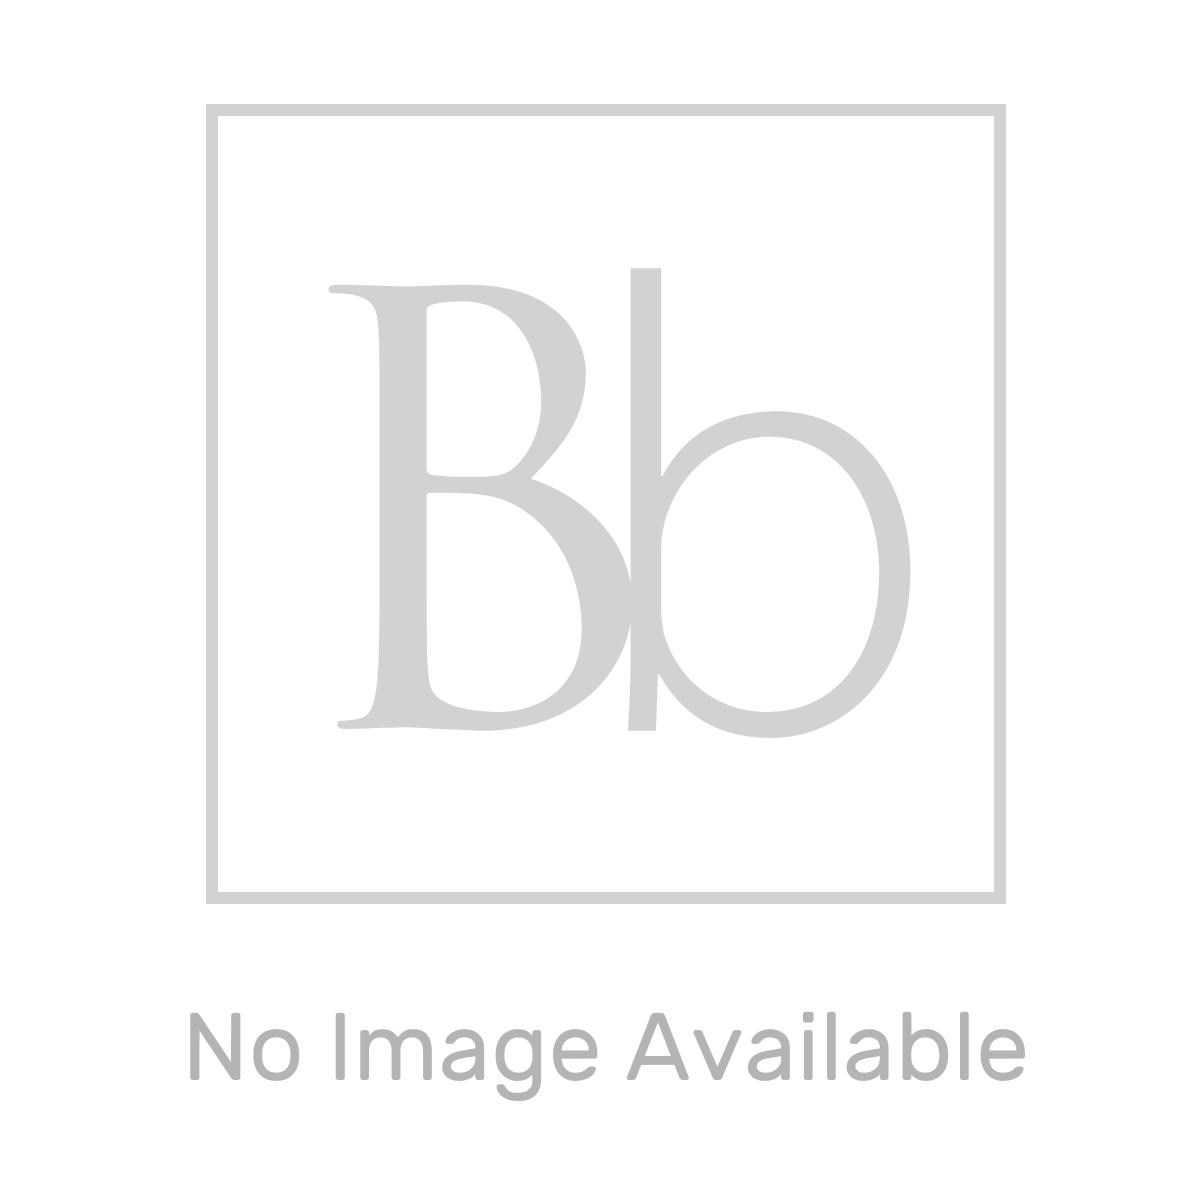 Tavistock Lansdown Arctic White Worktop 1280mm